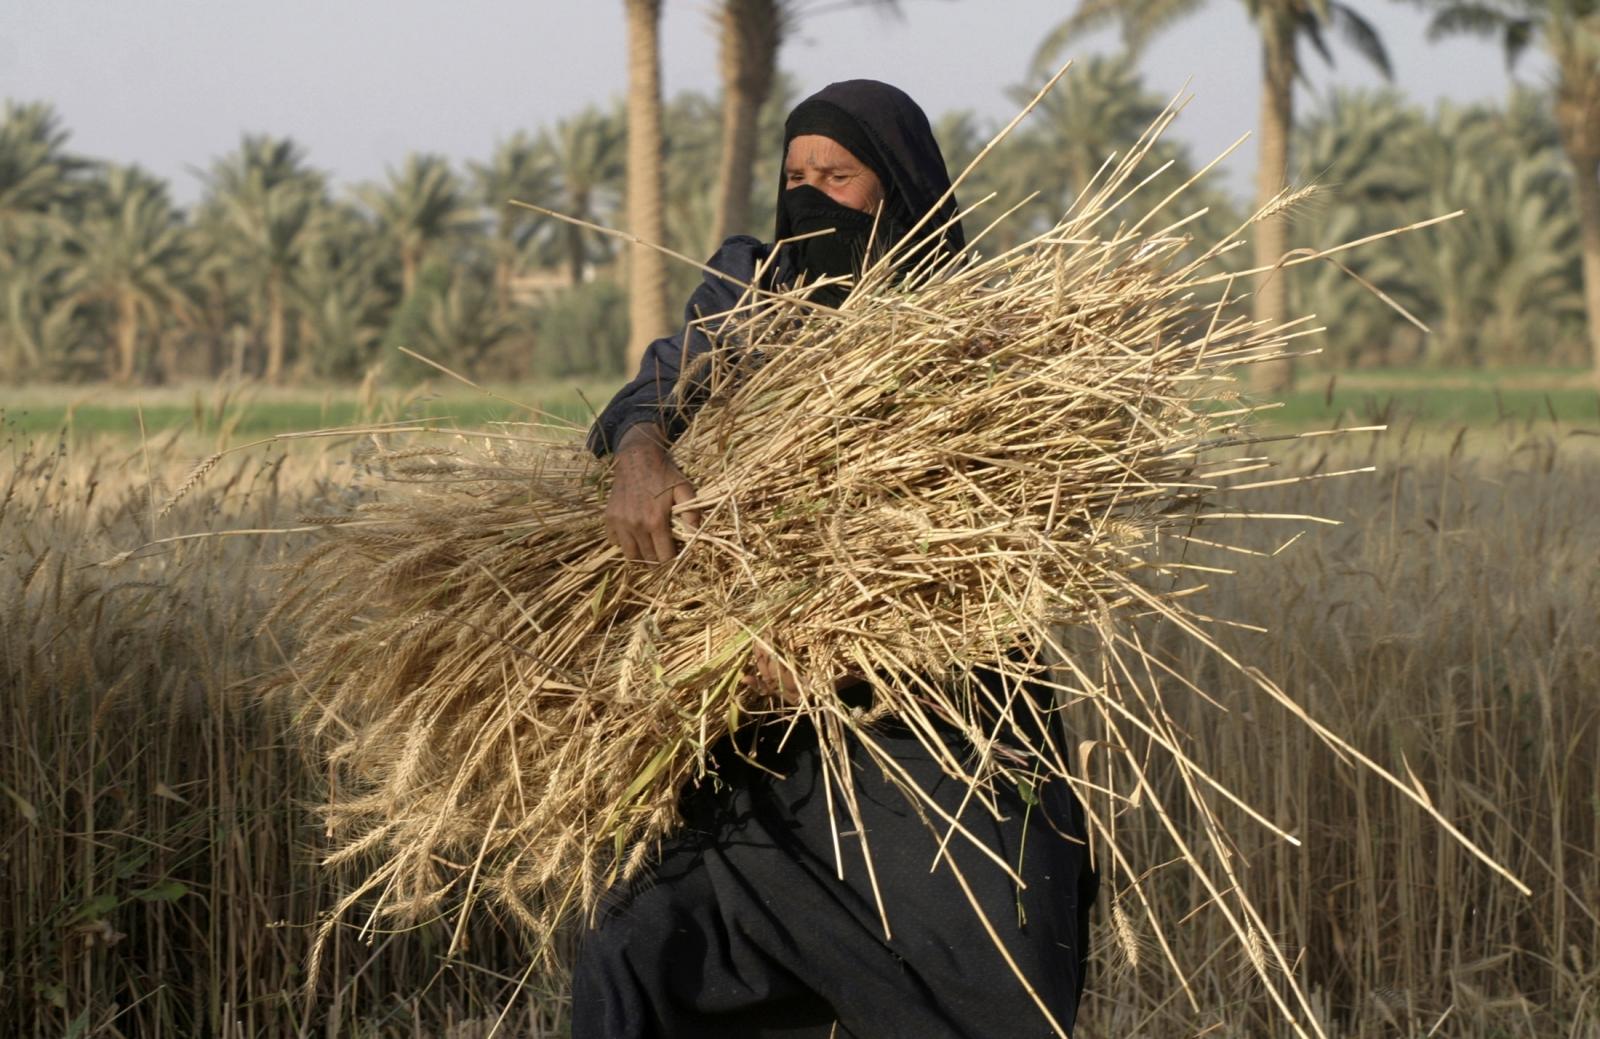 A woman carries a bundle of newly harvested wheat stalks in Albu Efan village southwest of Falluja